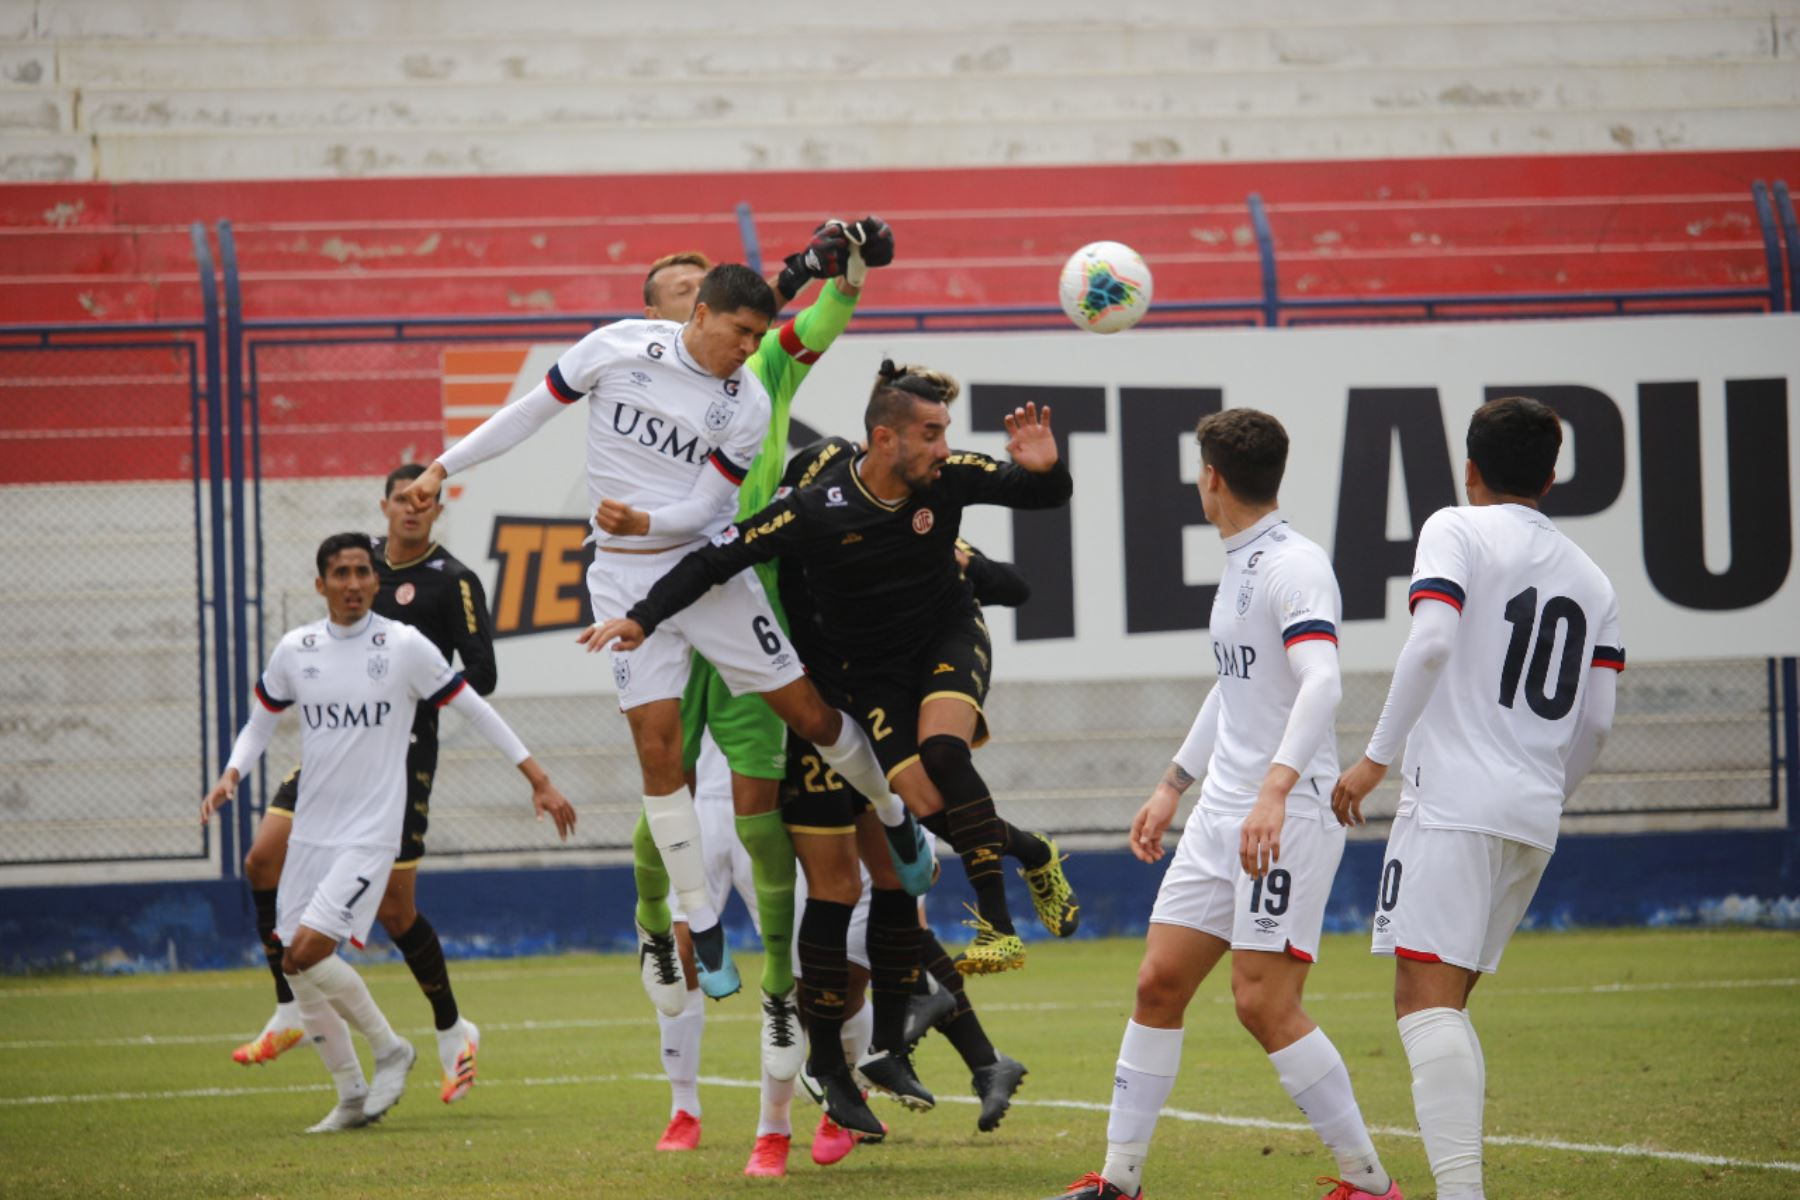 El futbolista D. Ojeda del Club UTC se enfrenta a J. Félix de la Universidad San Martín por la jornada 13 de la Liga 1, en el estadio Iván Elías Moreno. Foto: @LigaFutProf